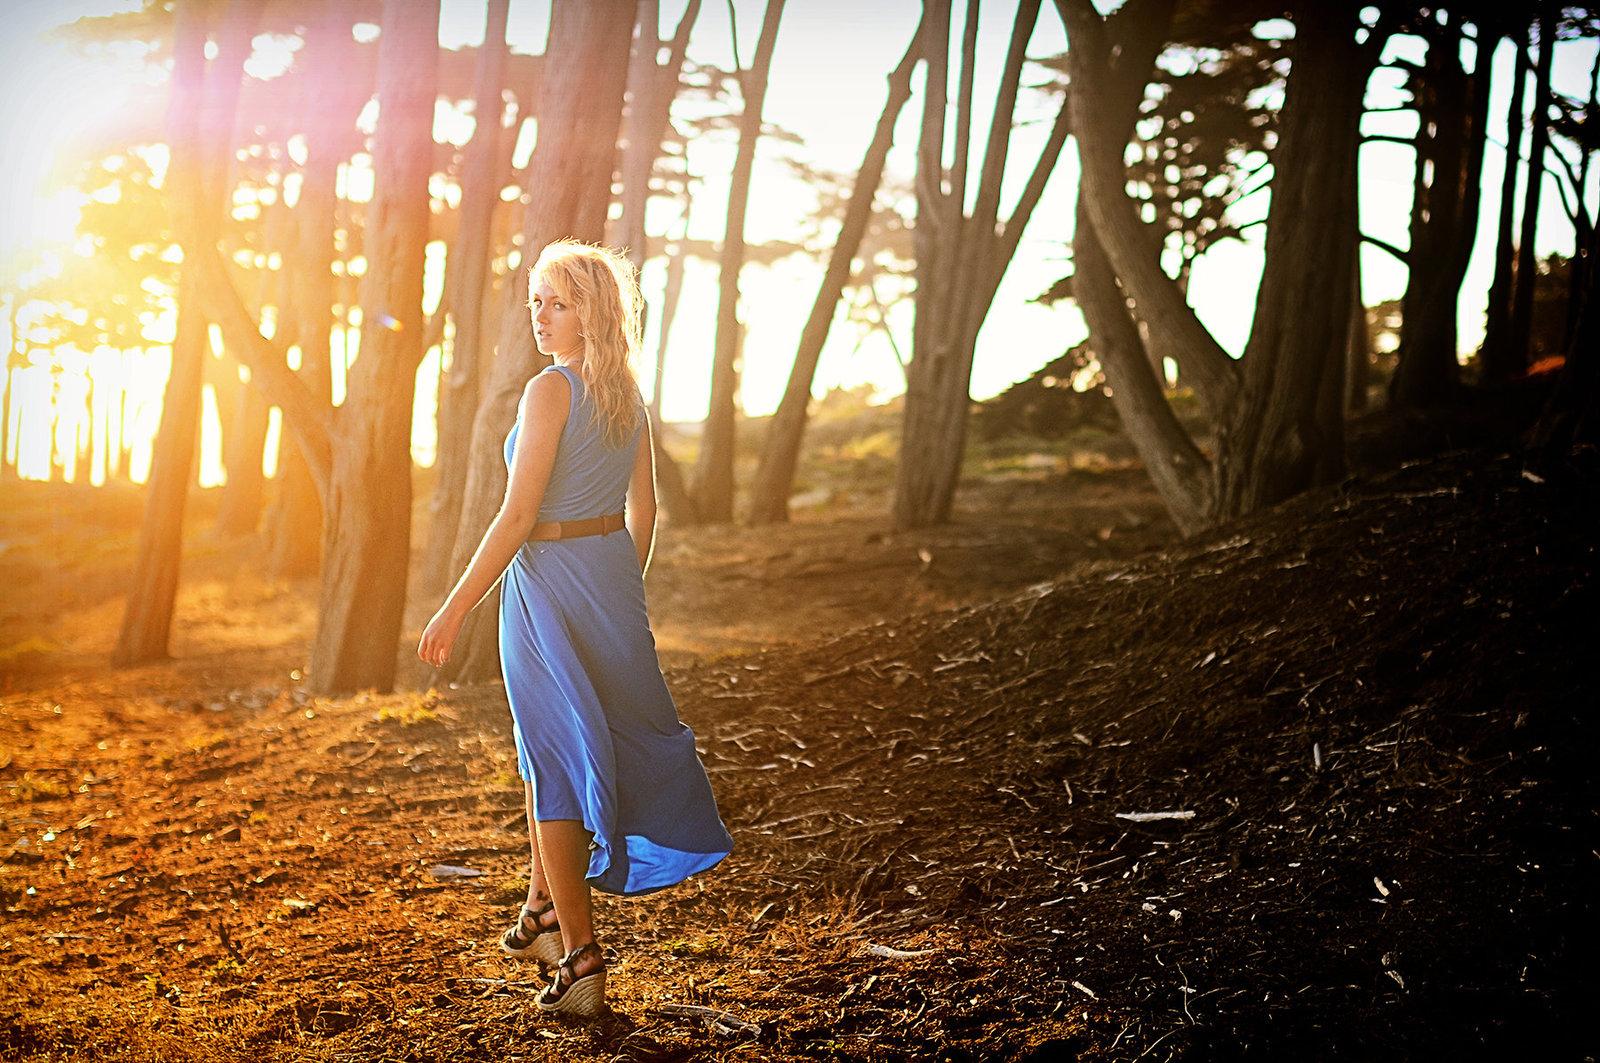 san francisco california senior photos destination portrait photographer bryan newfield photography 58